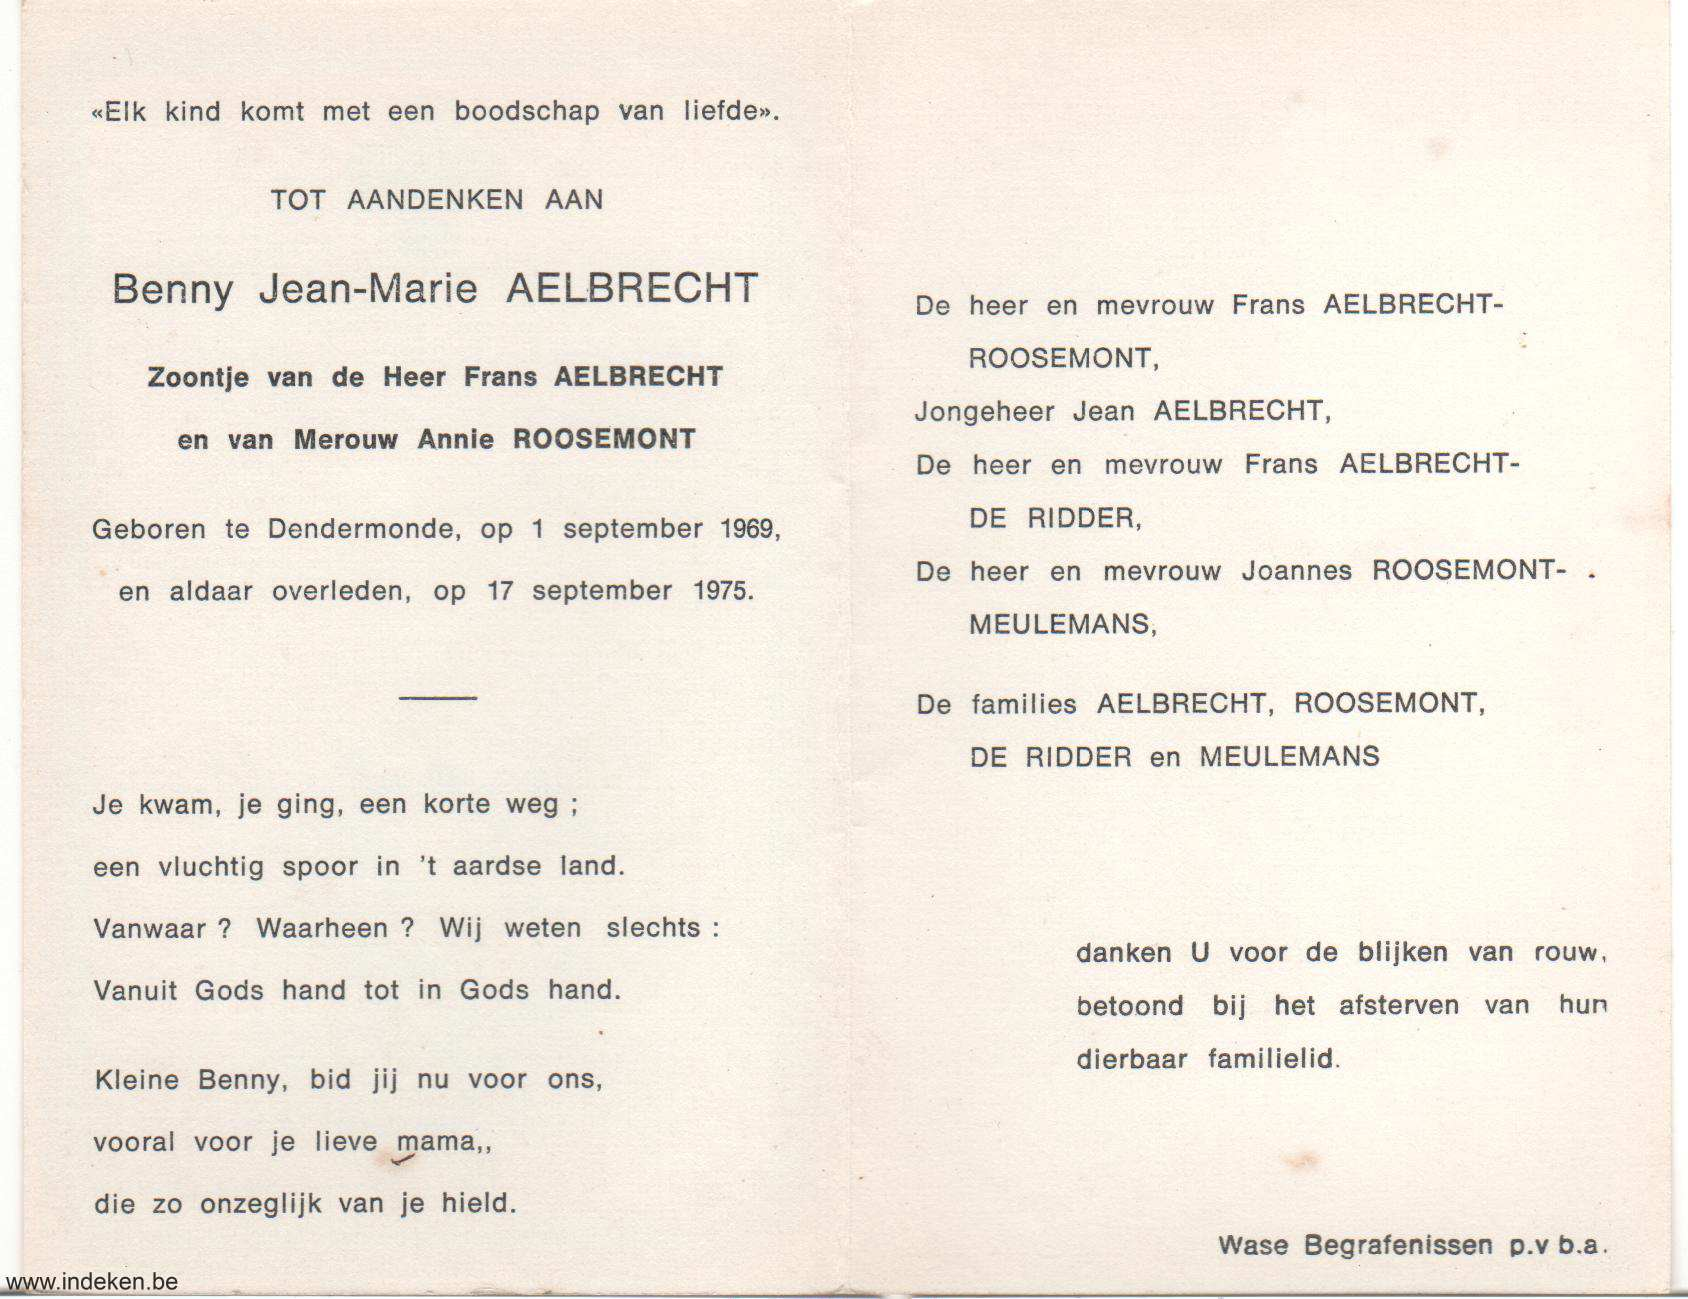 Benny Jean-Marie Aelbrecht